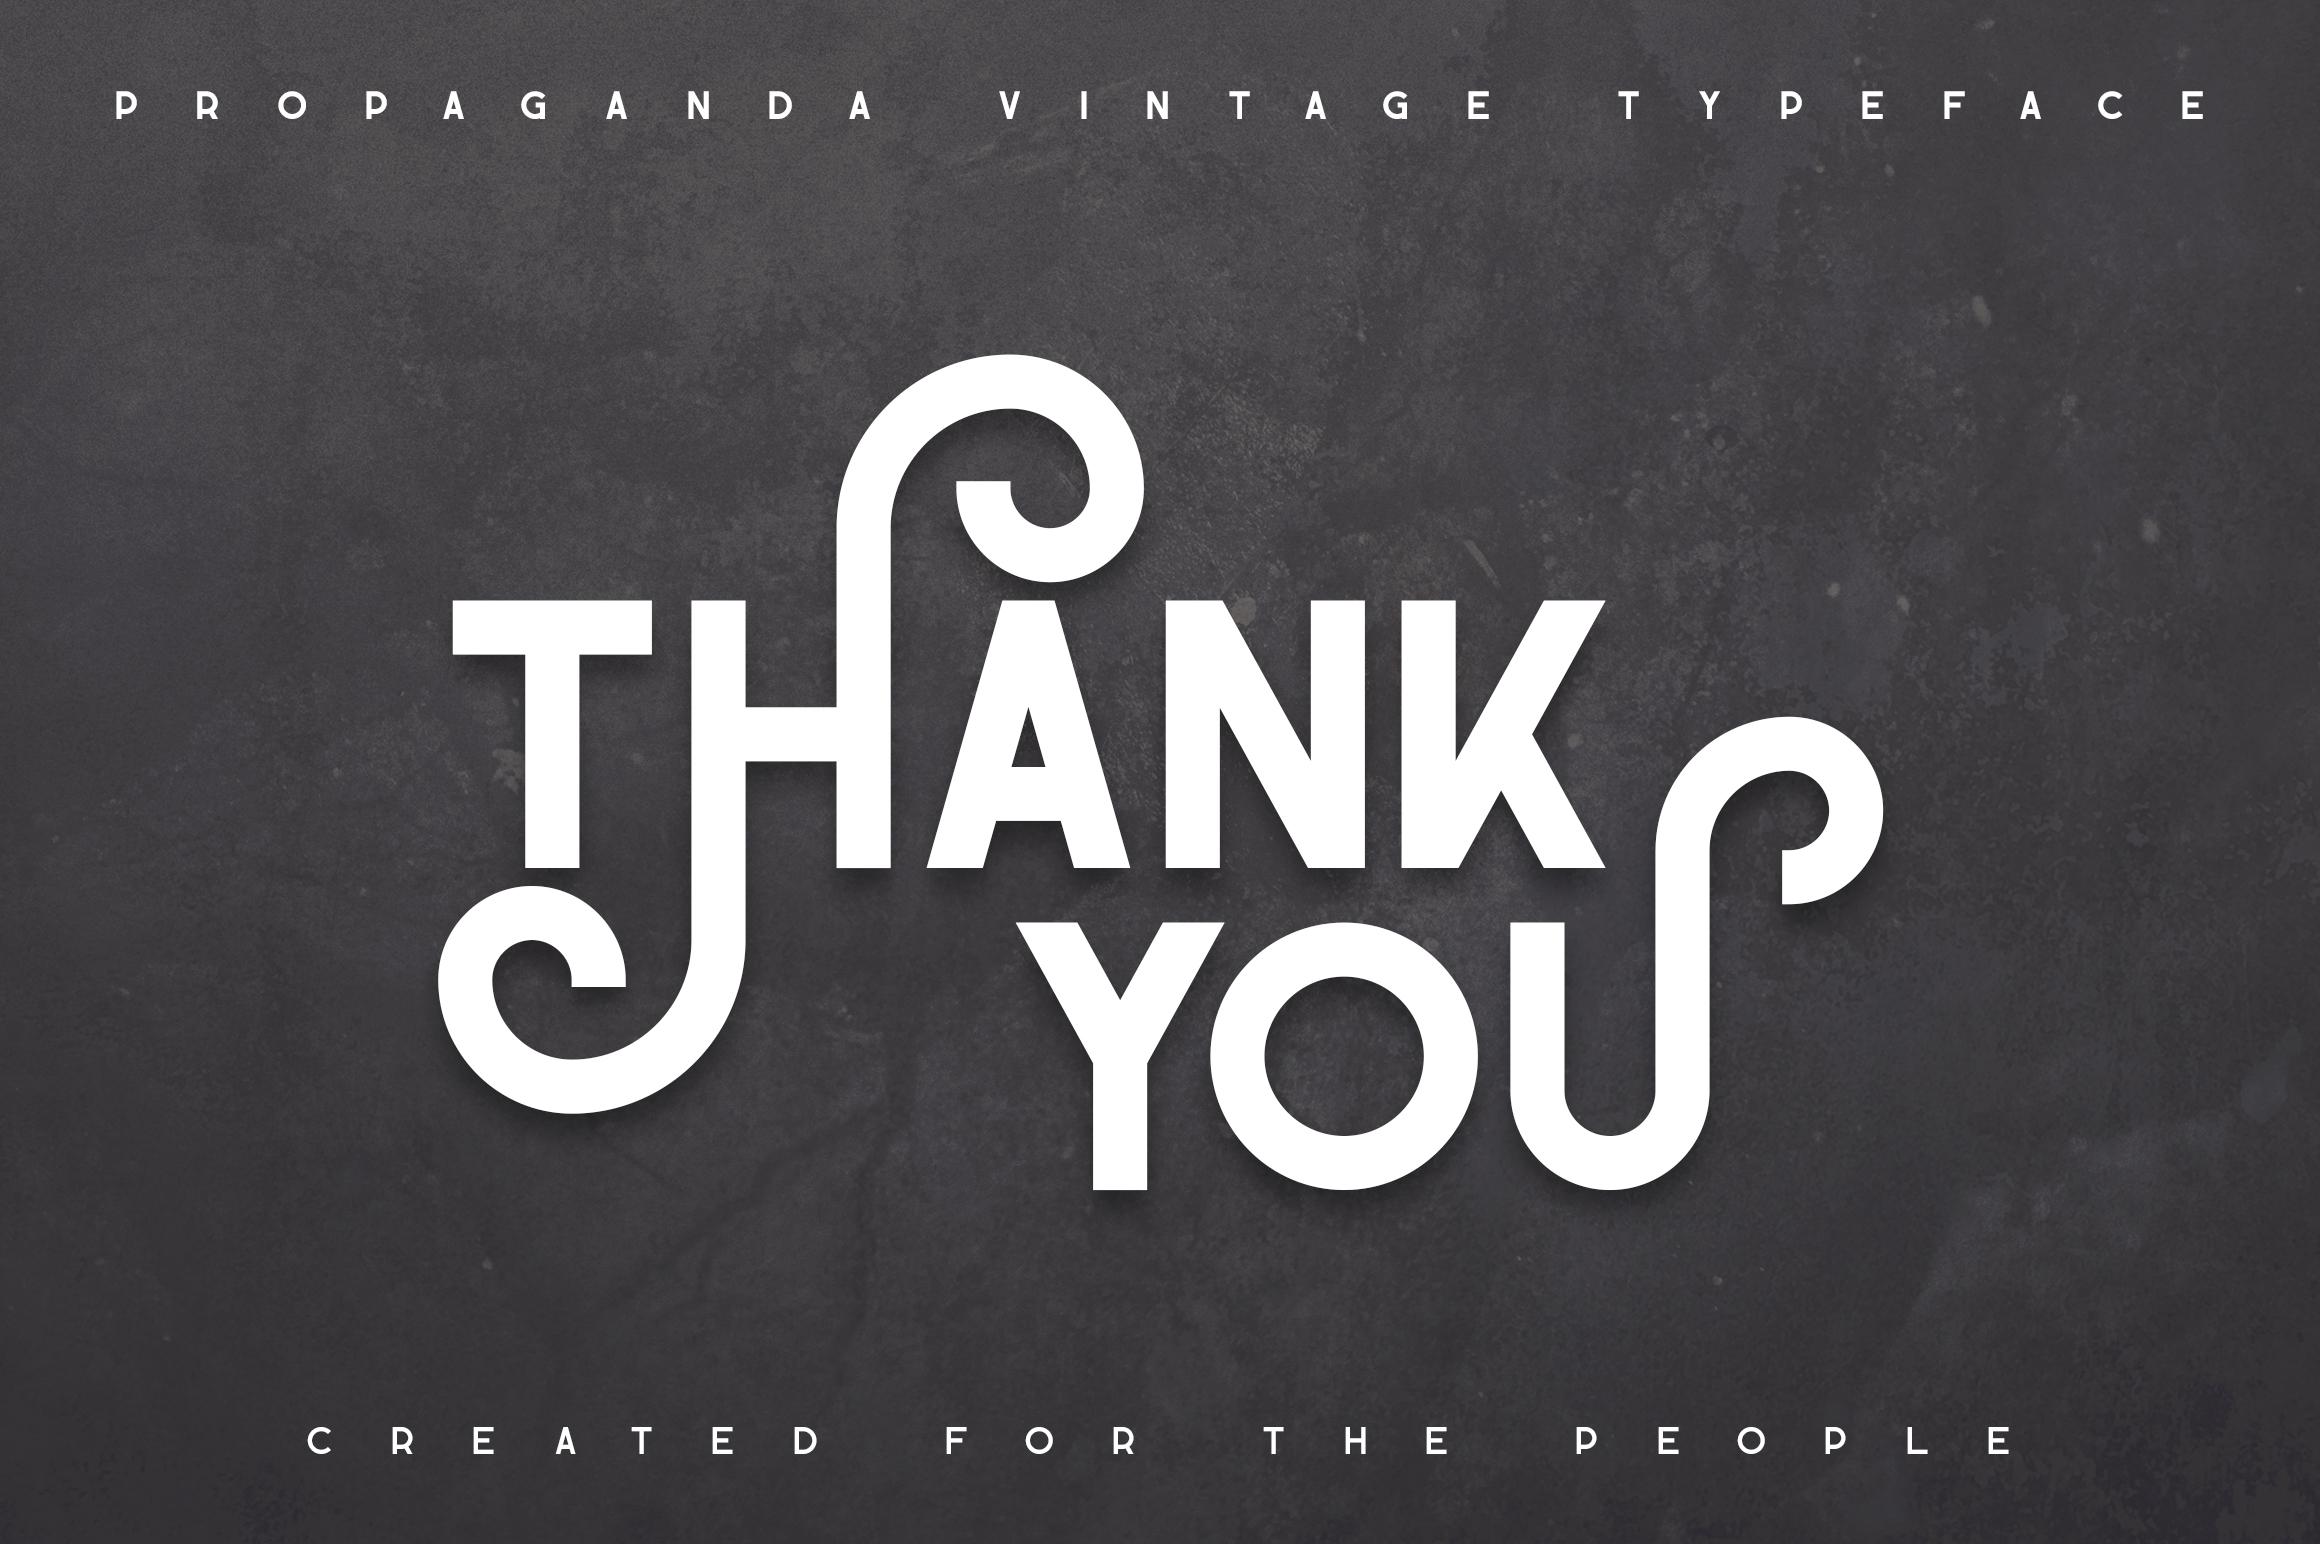 Propaganda - Vintage typeface example image 12